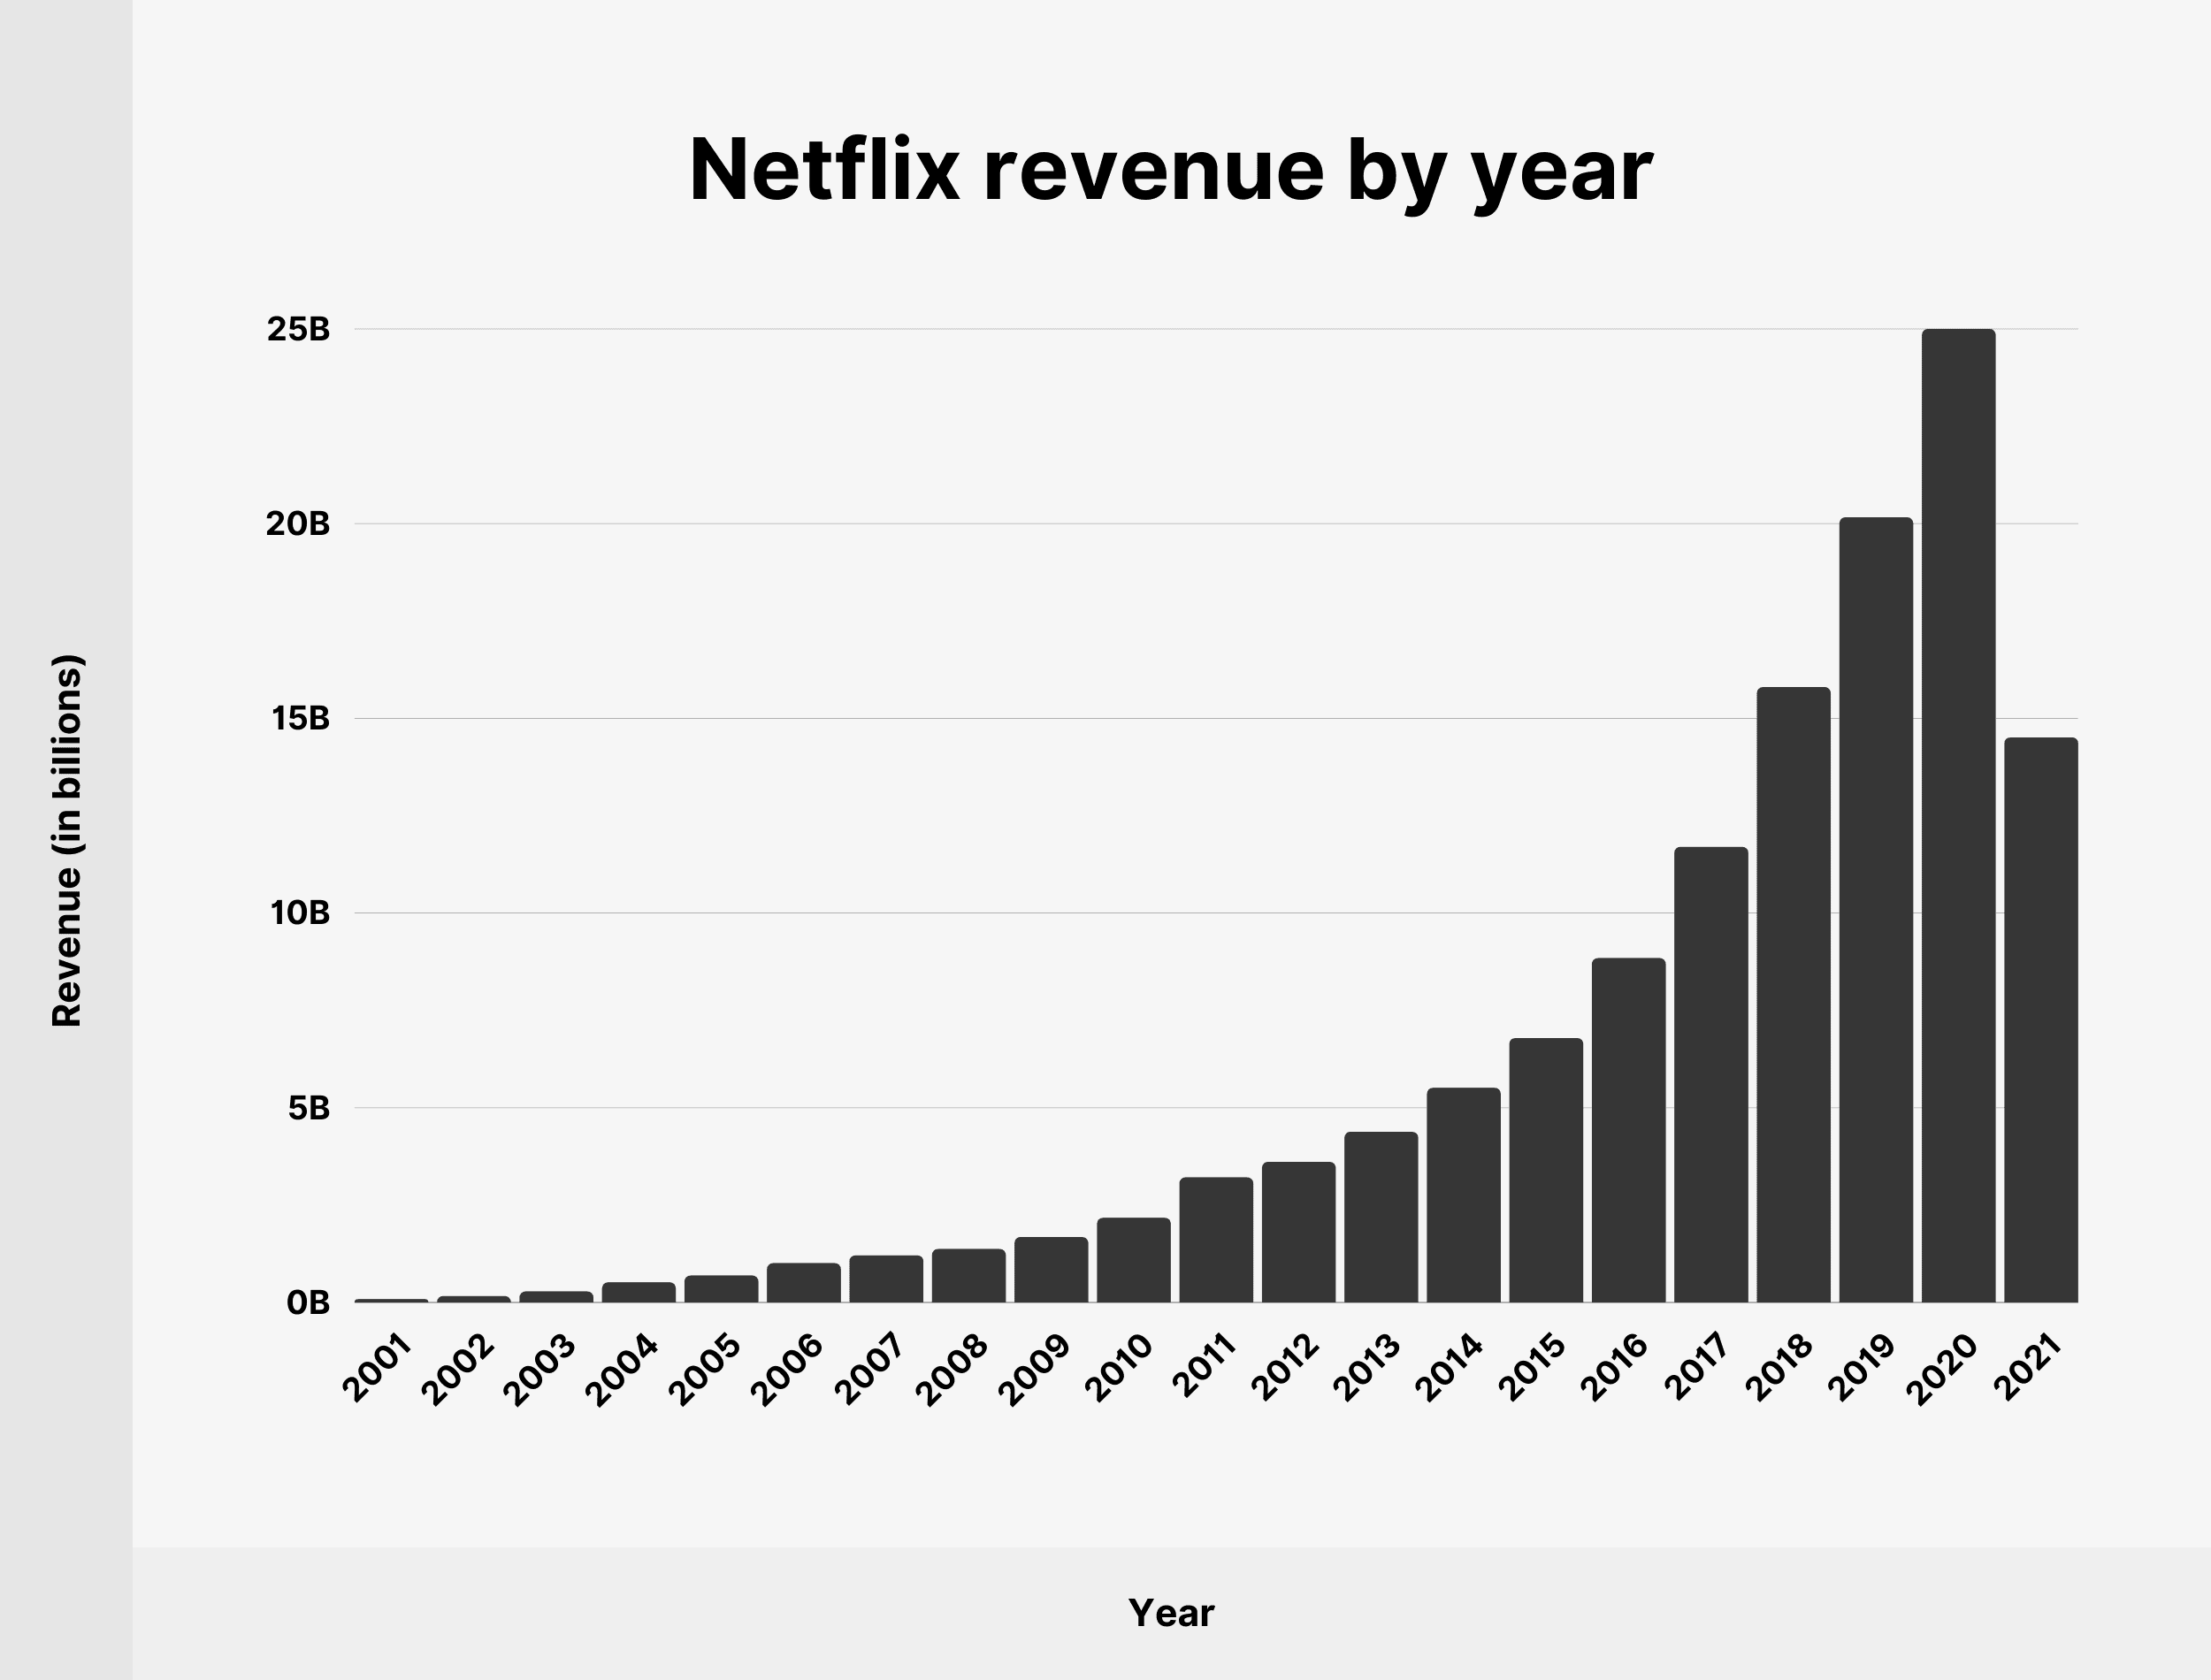 Netflix revenue by year